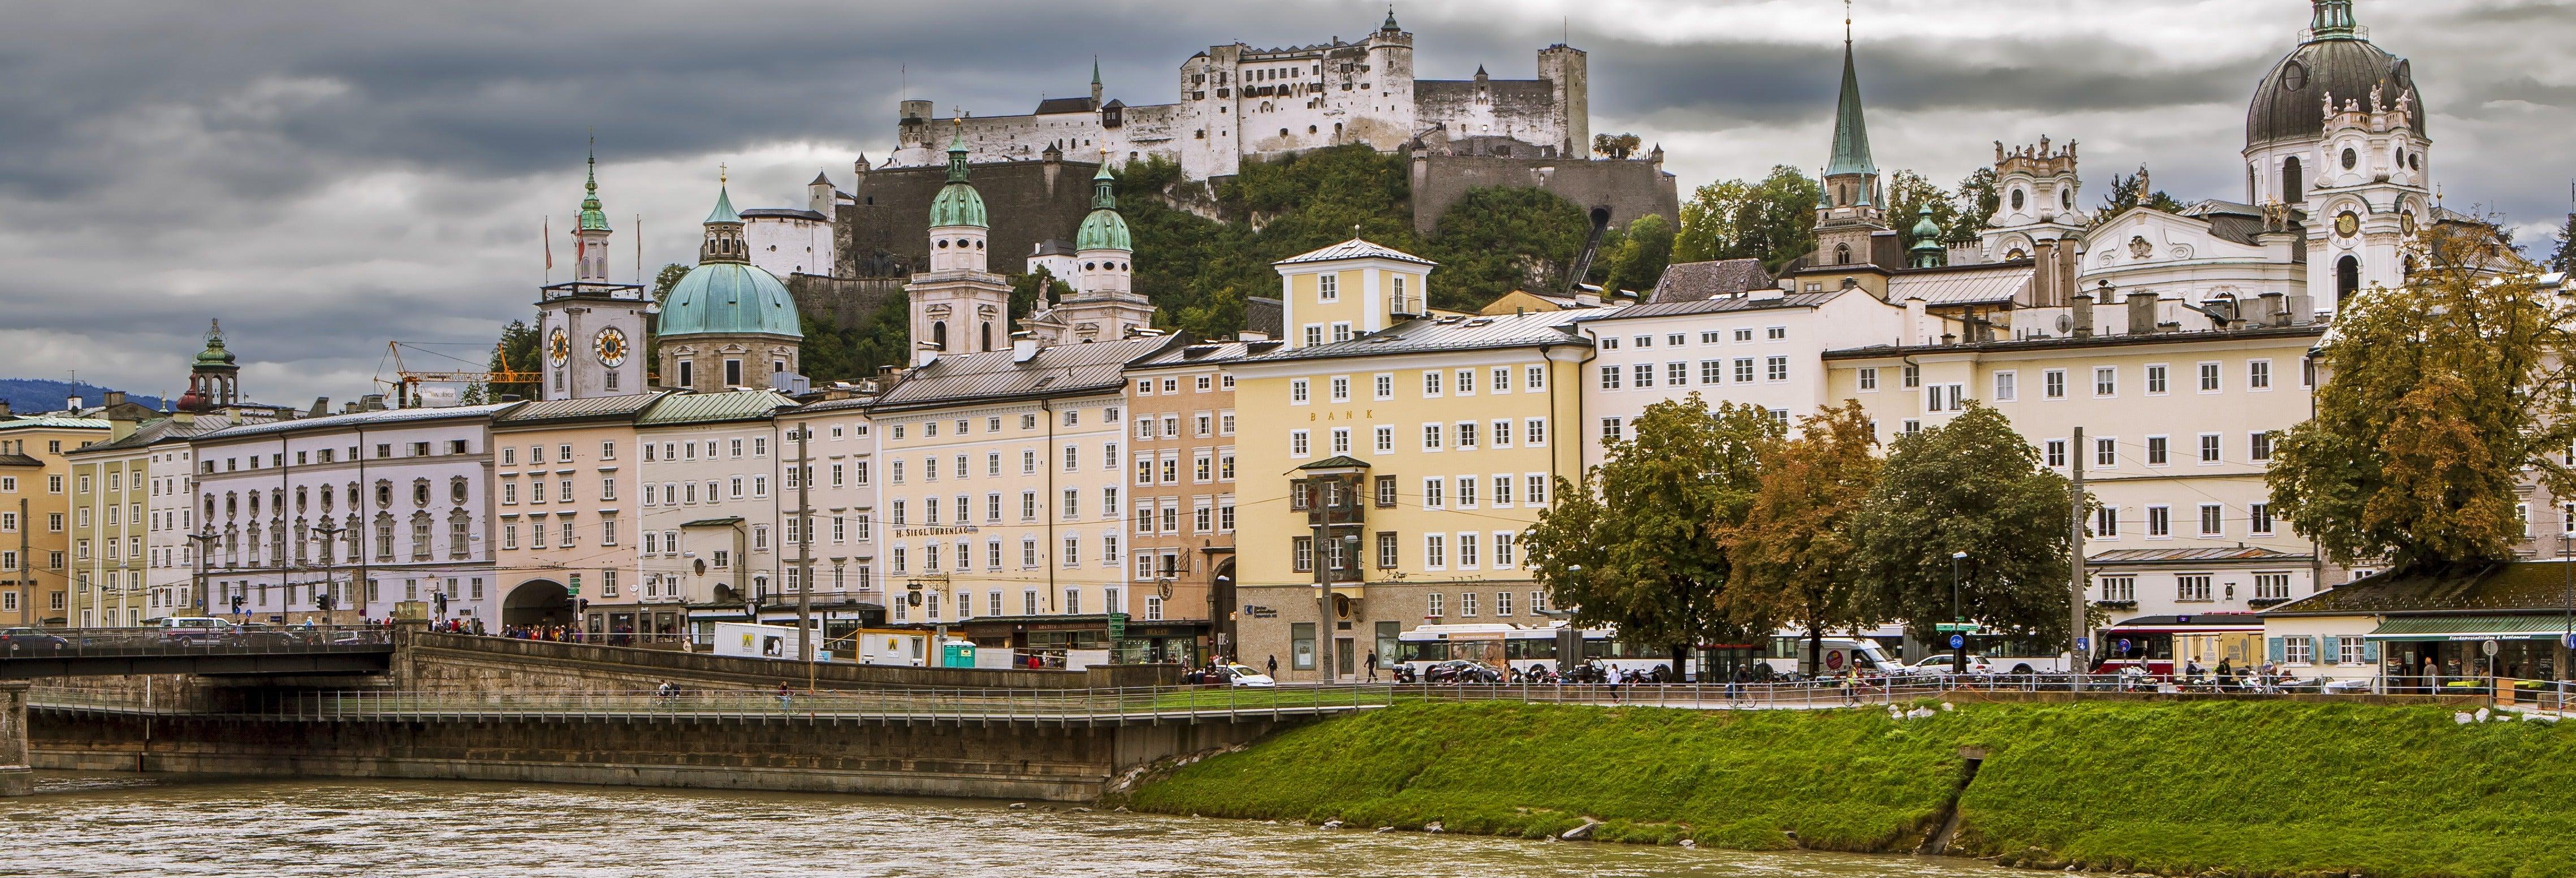 Salzburg Boat Ride